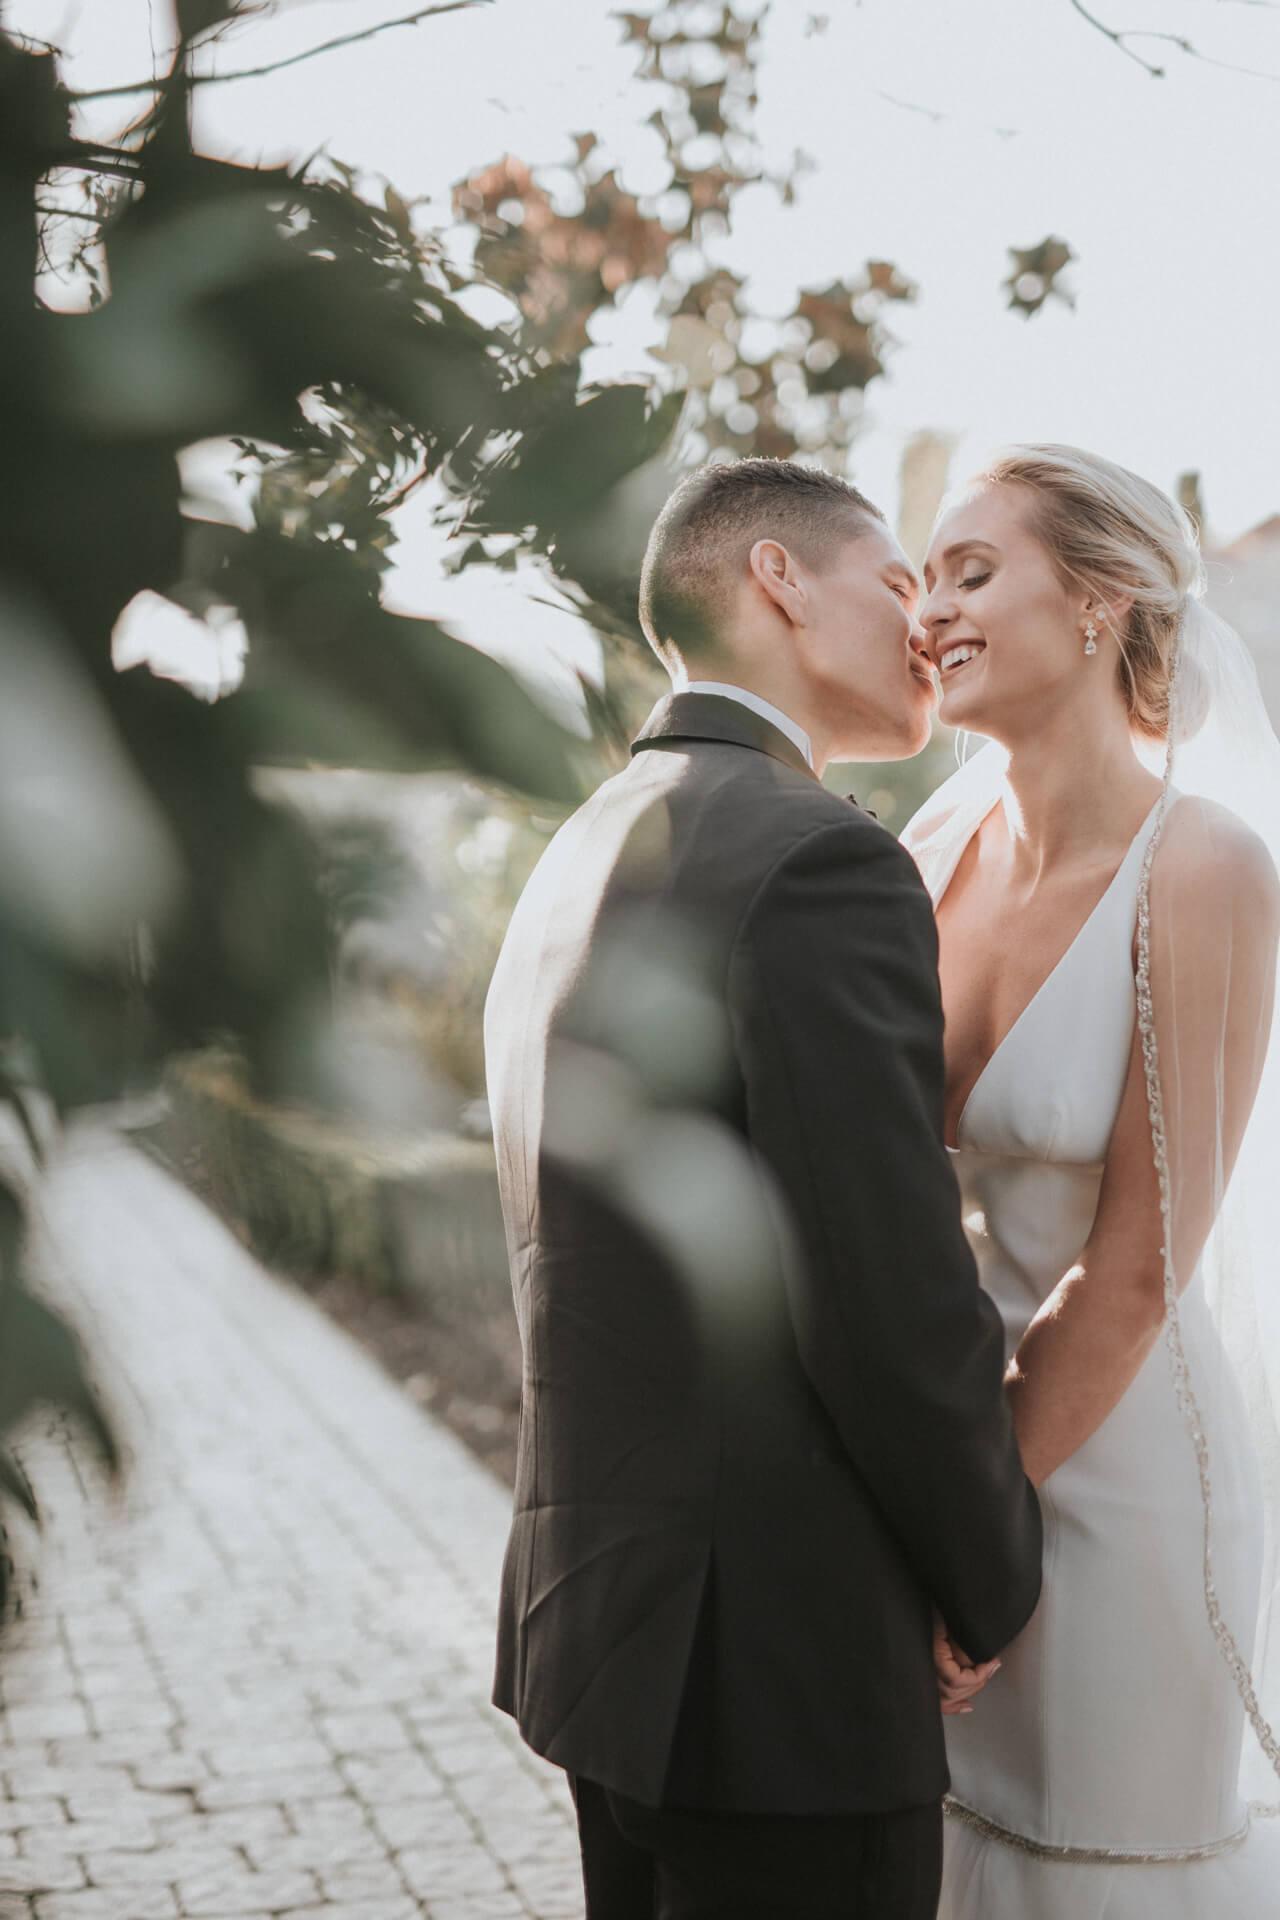 Minneapolis Wedding Photography | Cluney Photography